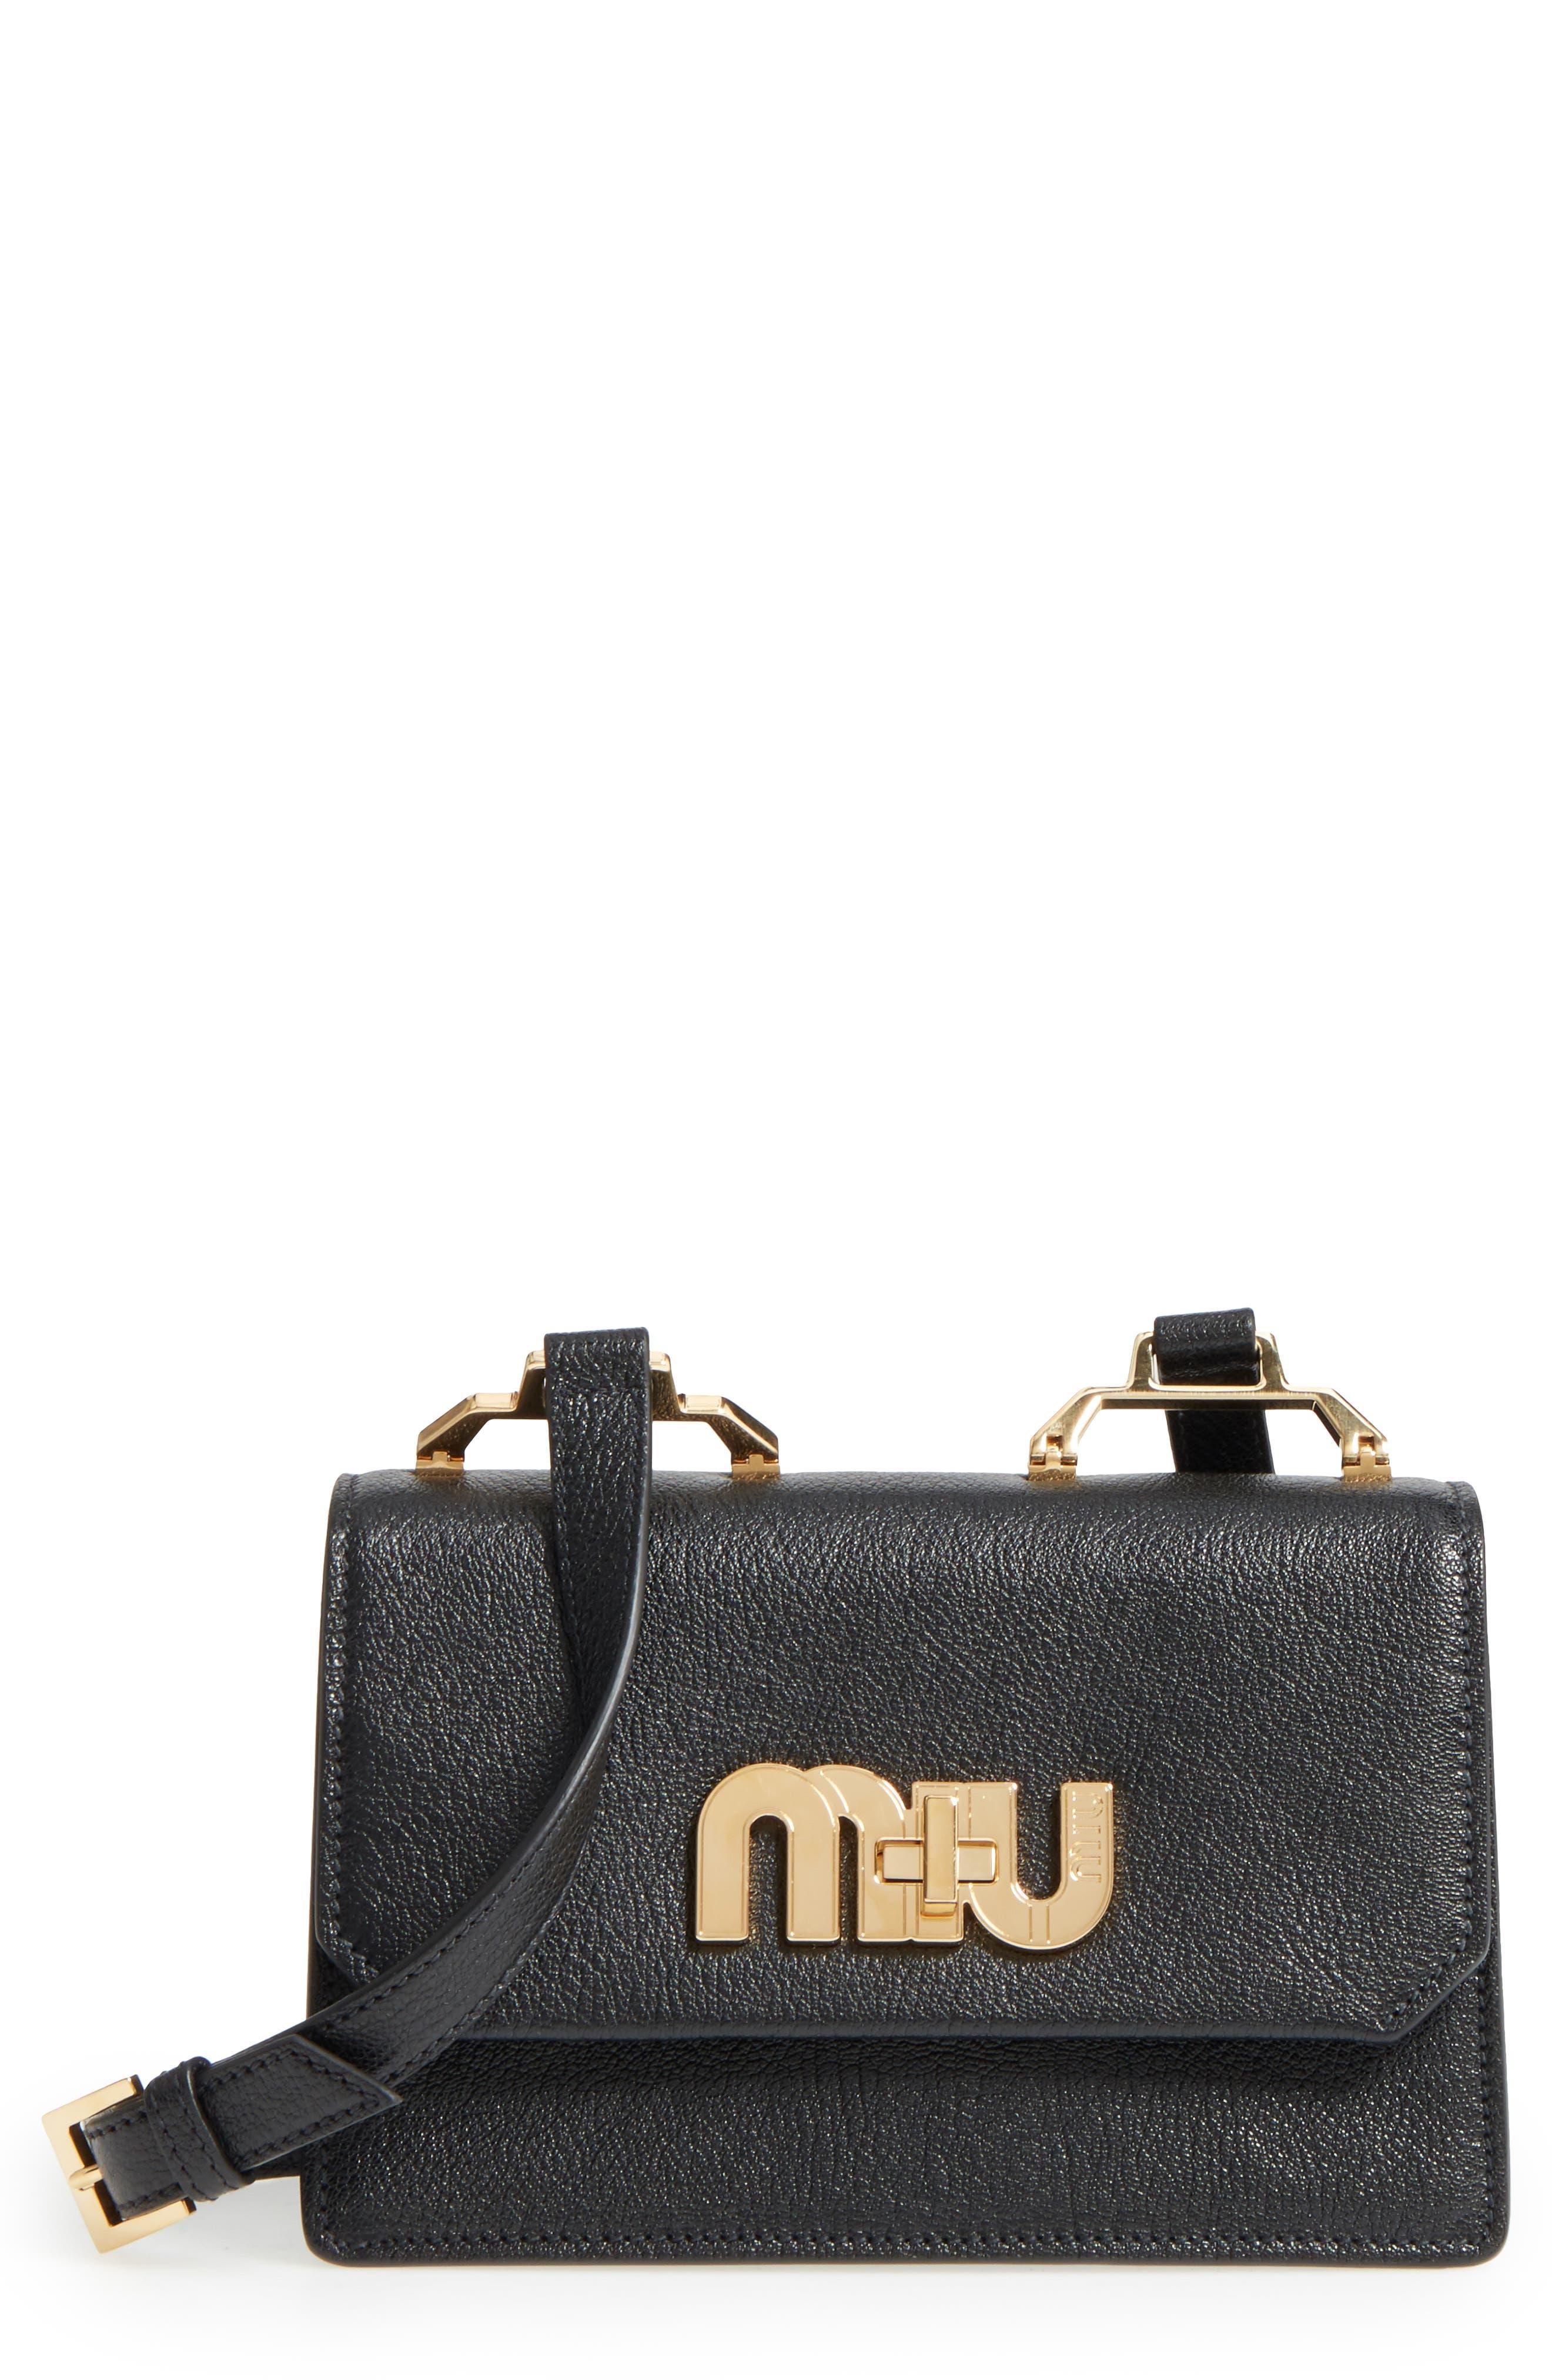 Madras Leather Crossbody Bag,                             Main thumbnail 1, color,                             001